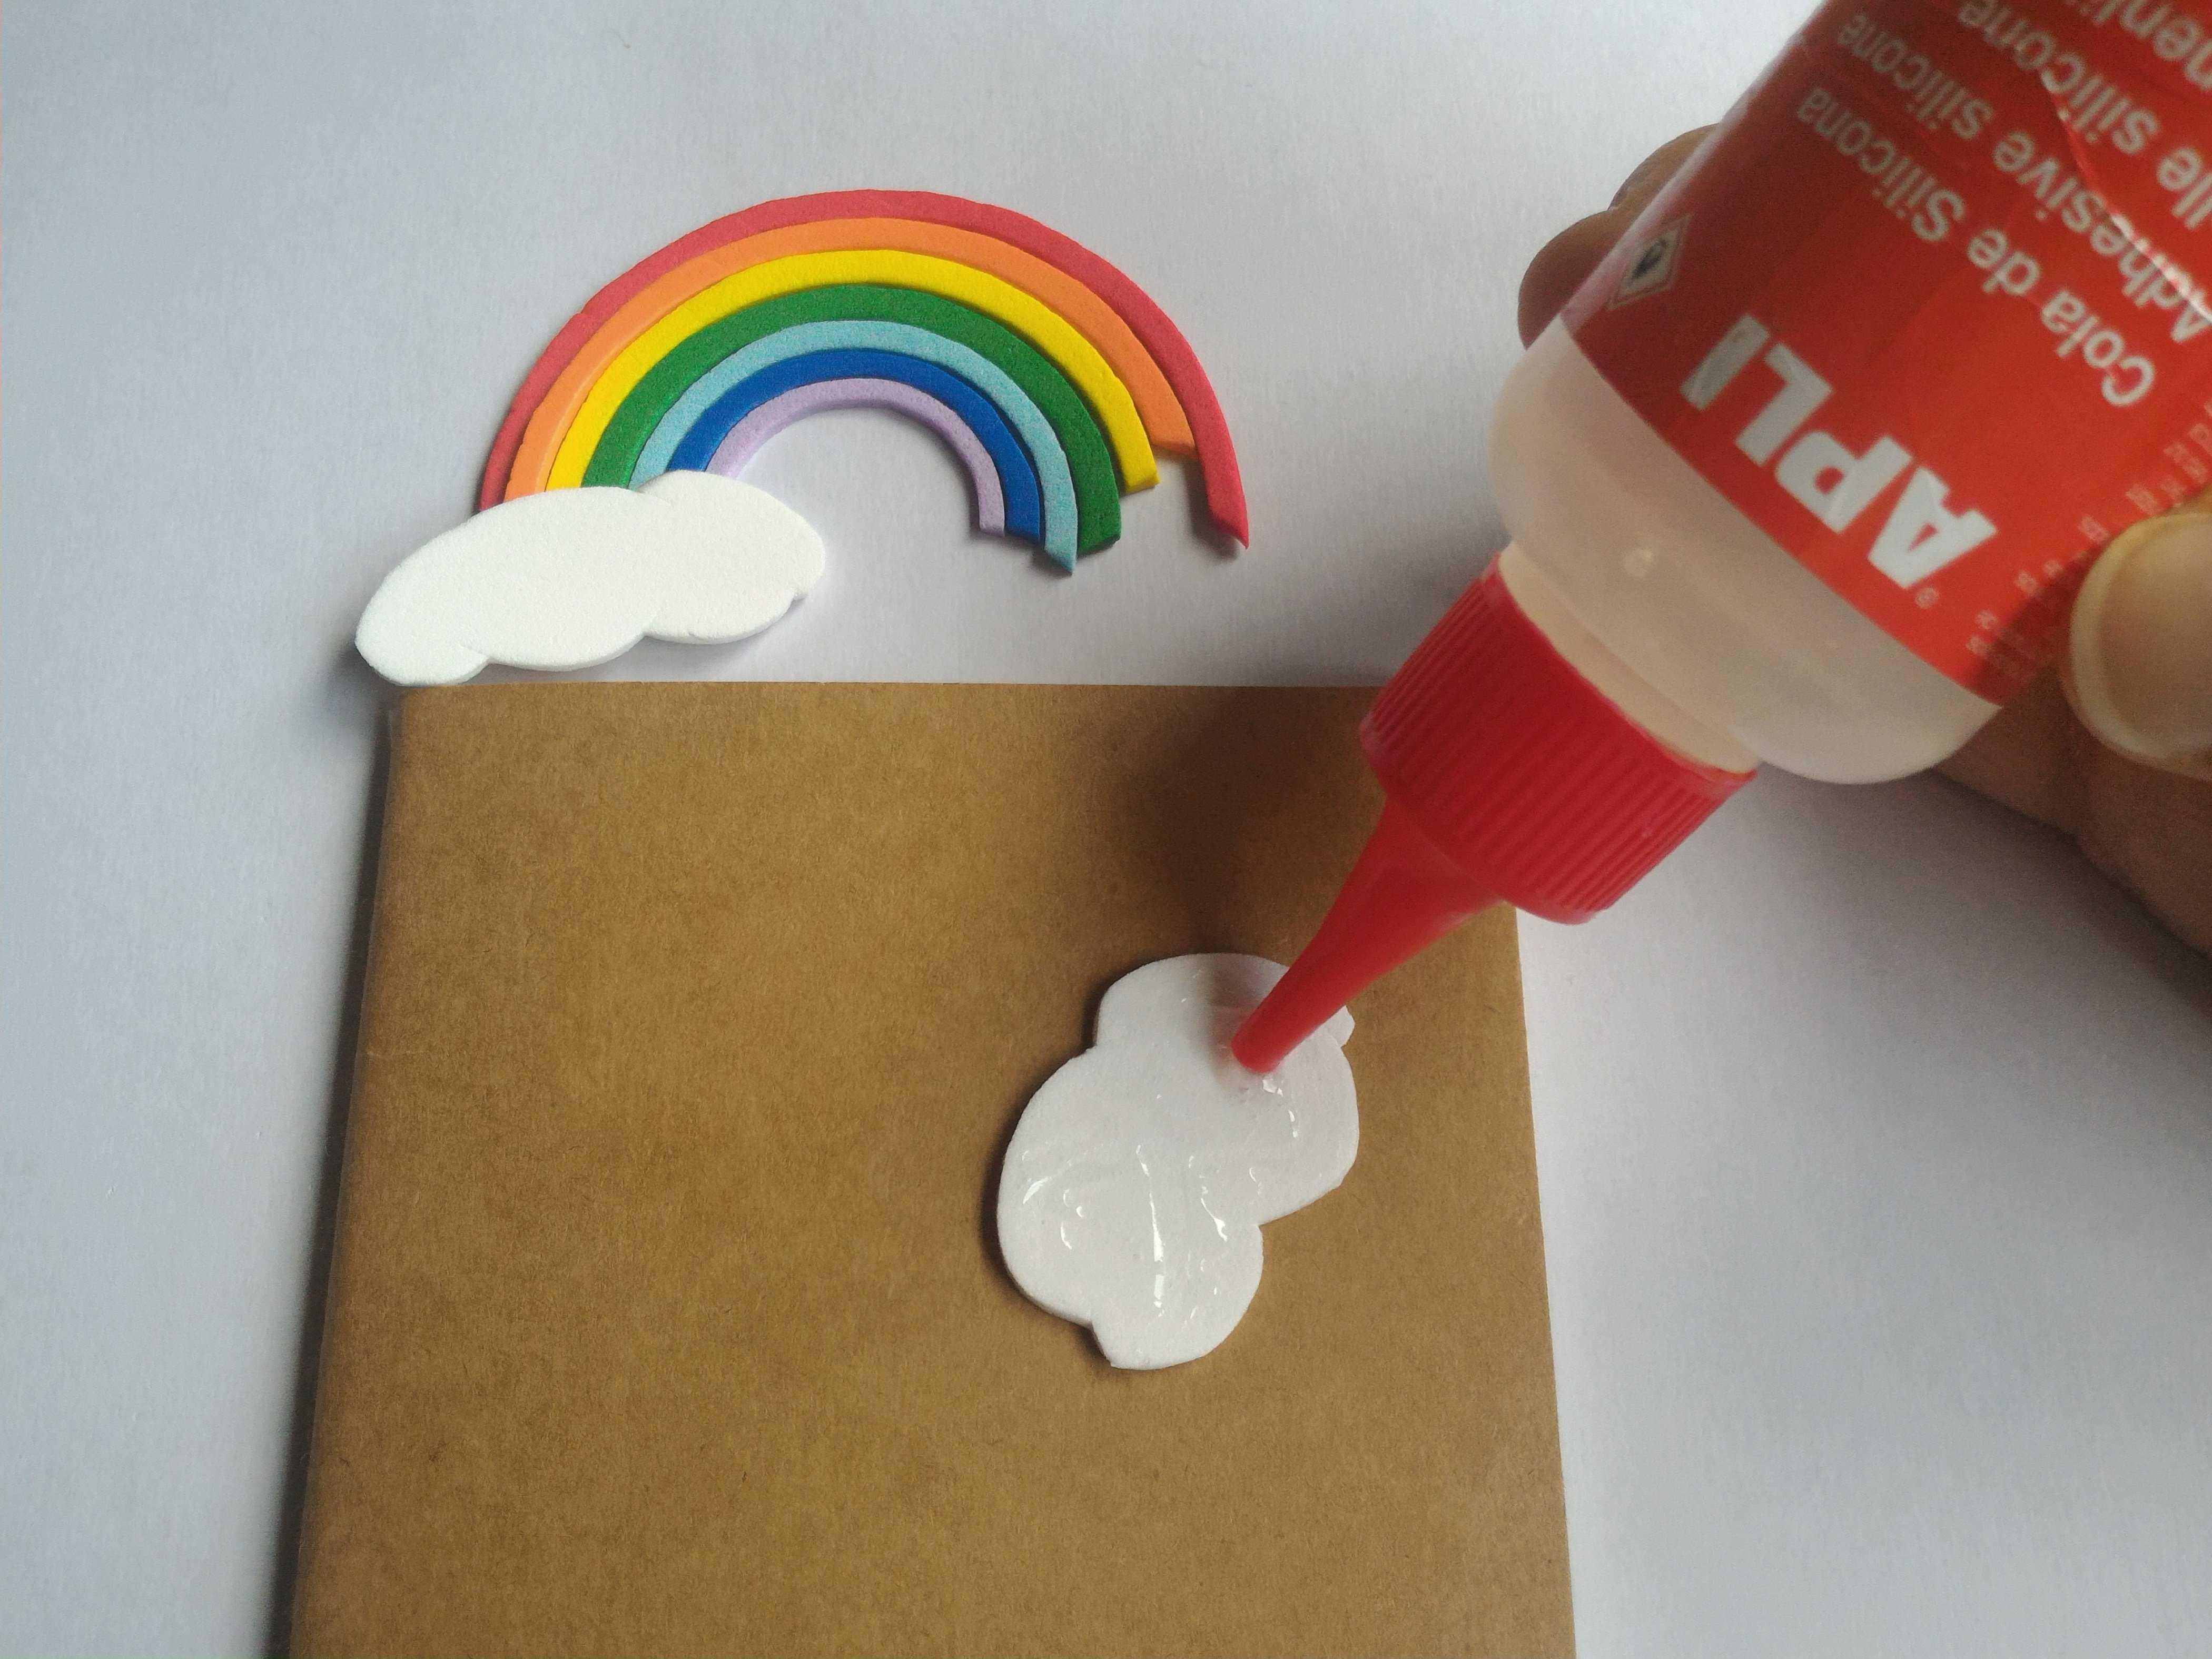 Medium 13   oam   ouiareclafc   rainbow   chagaz et vous